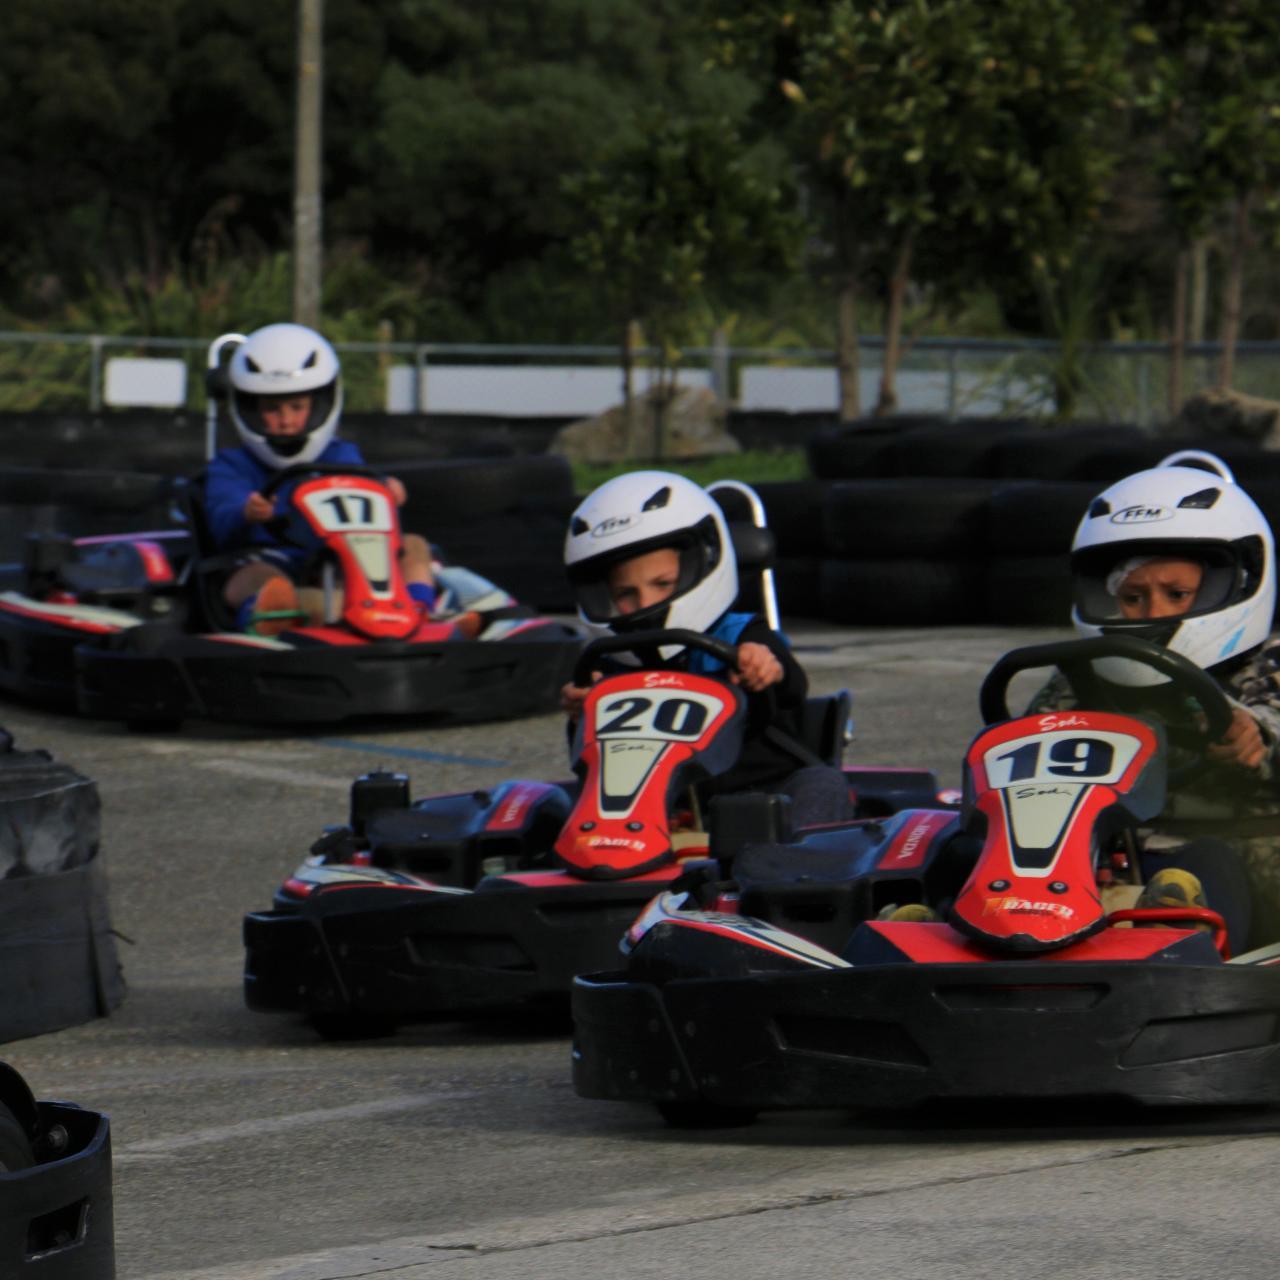 Fun Karts - BUY ONLINE & SAVE!!